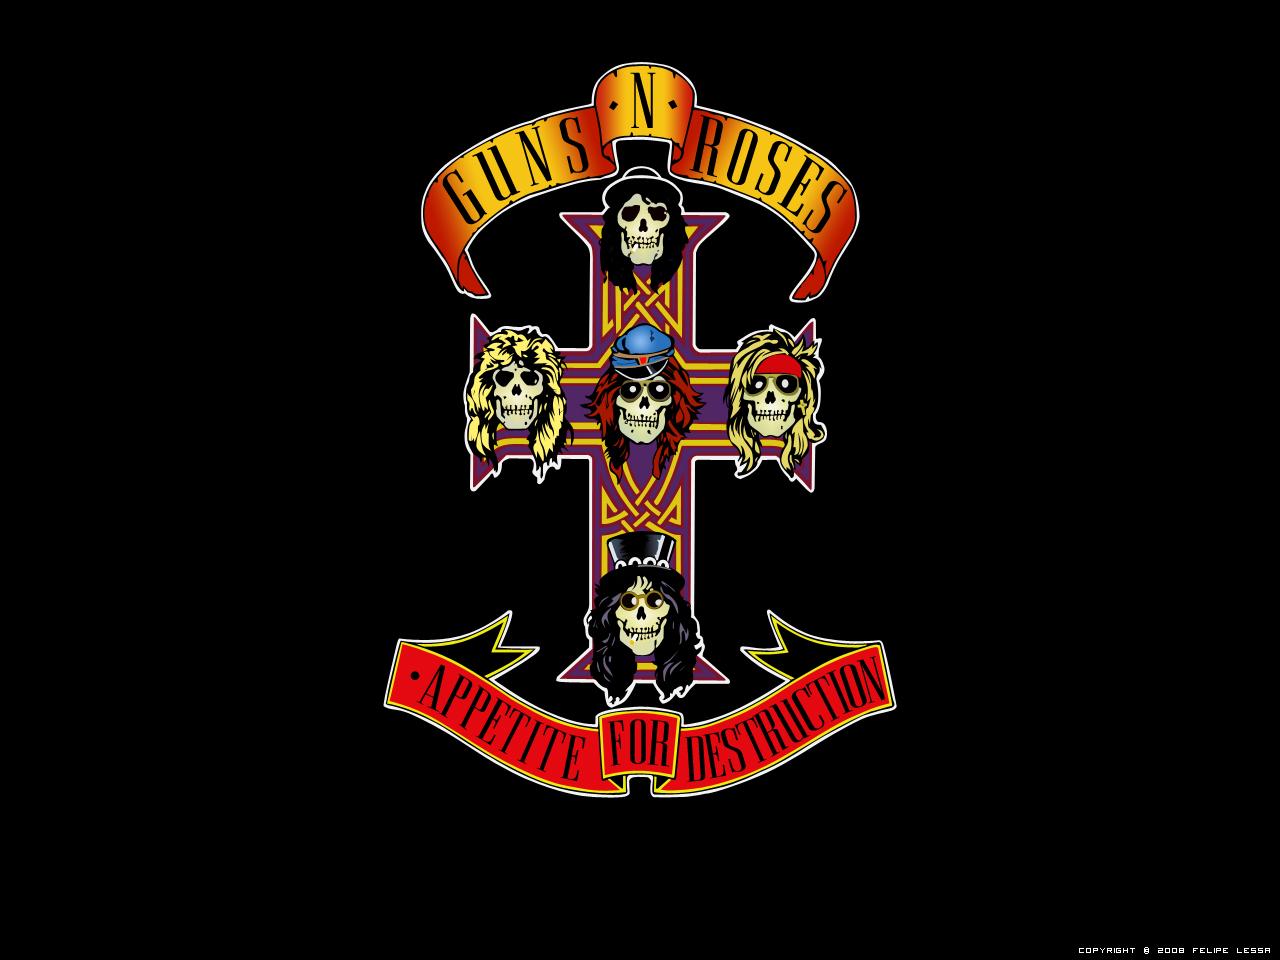 Guns N Roses Wallpaper: Wallpaper Guns N' Roses By Felipelessa On DeviantArt